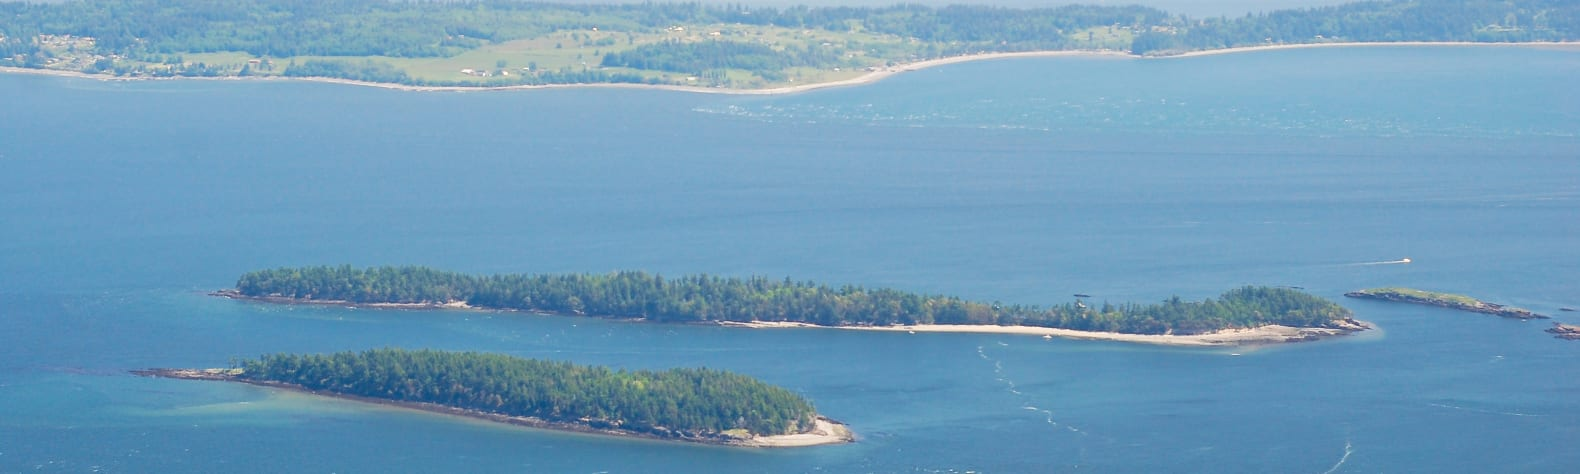 Clark Island Marine State Park